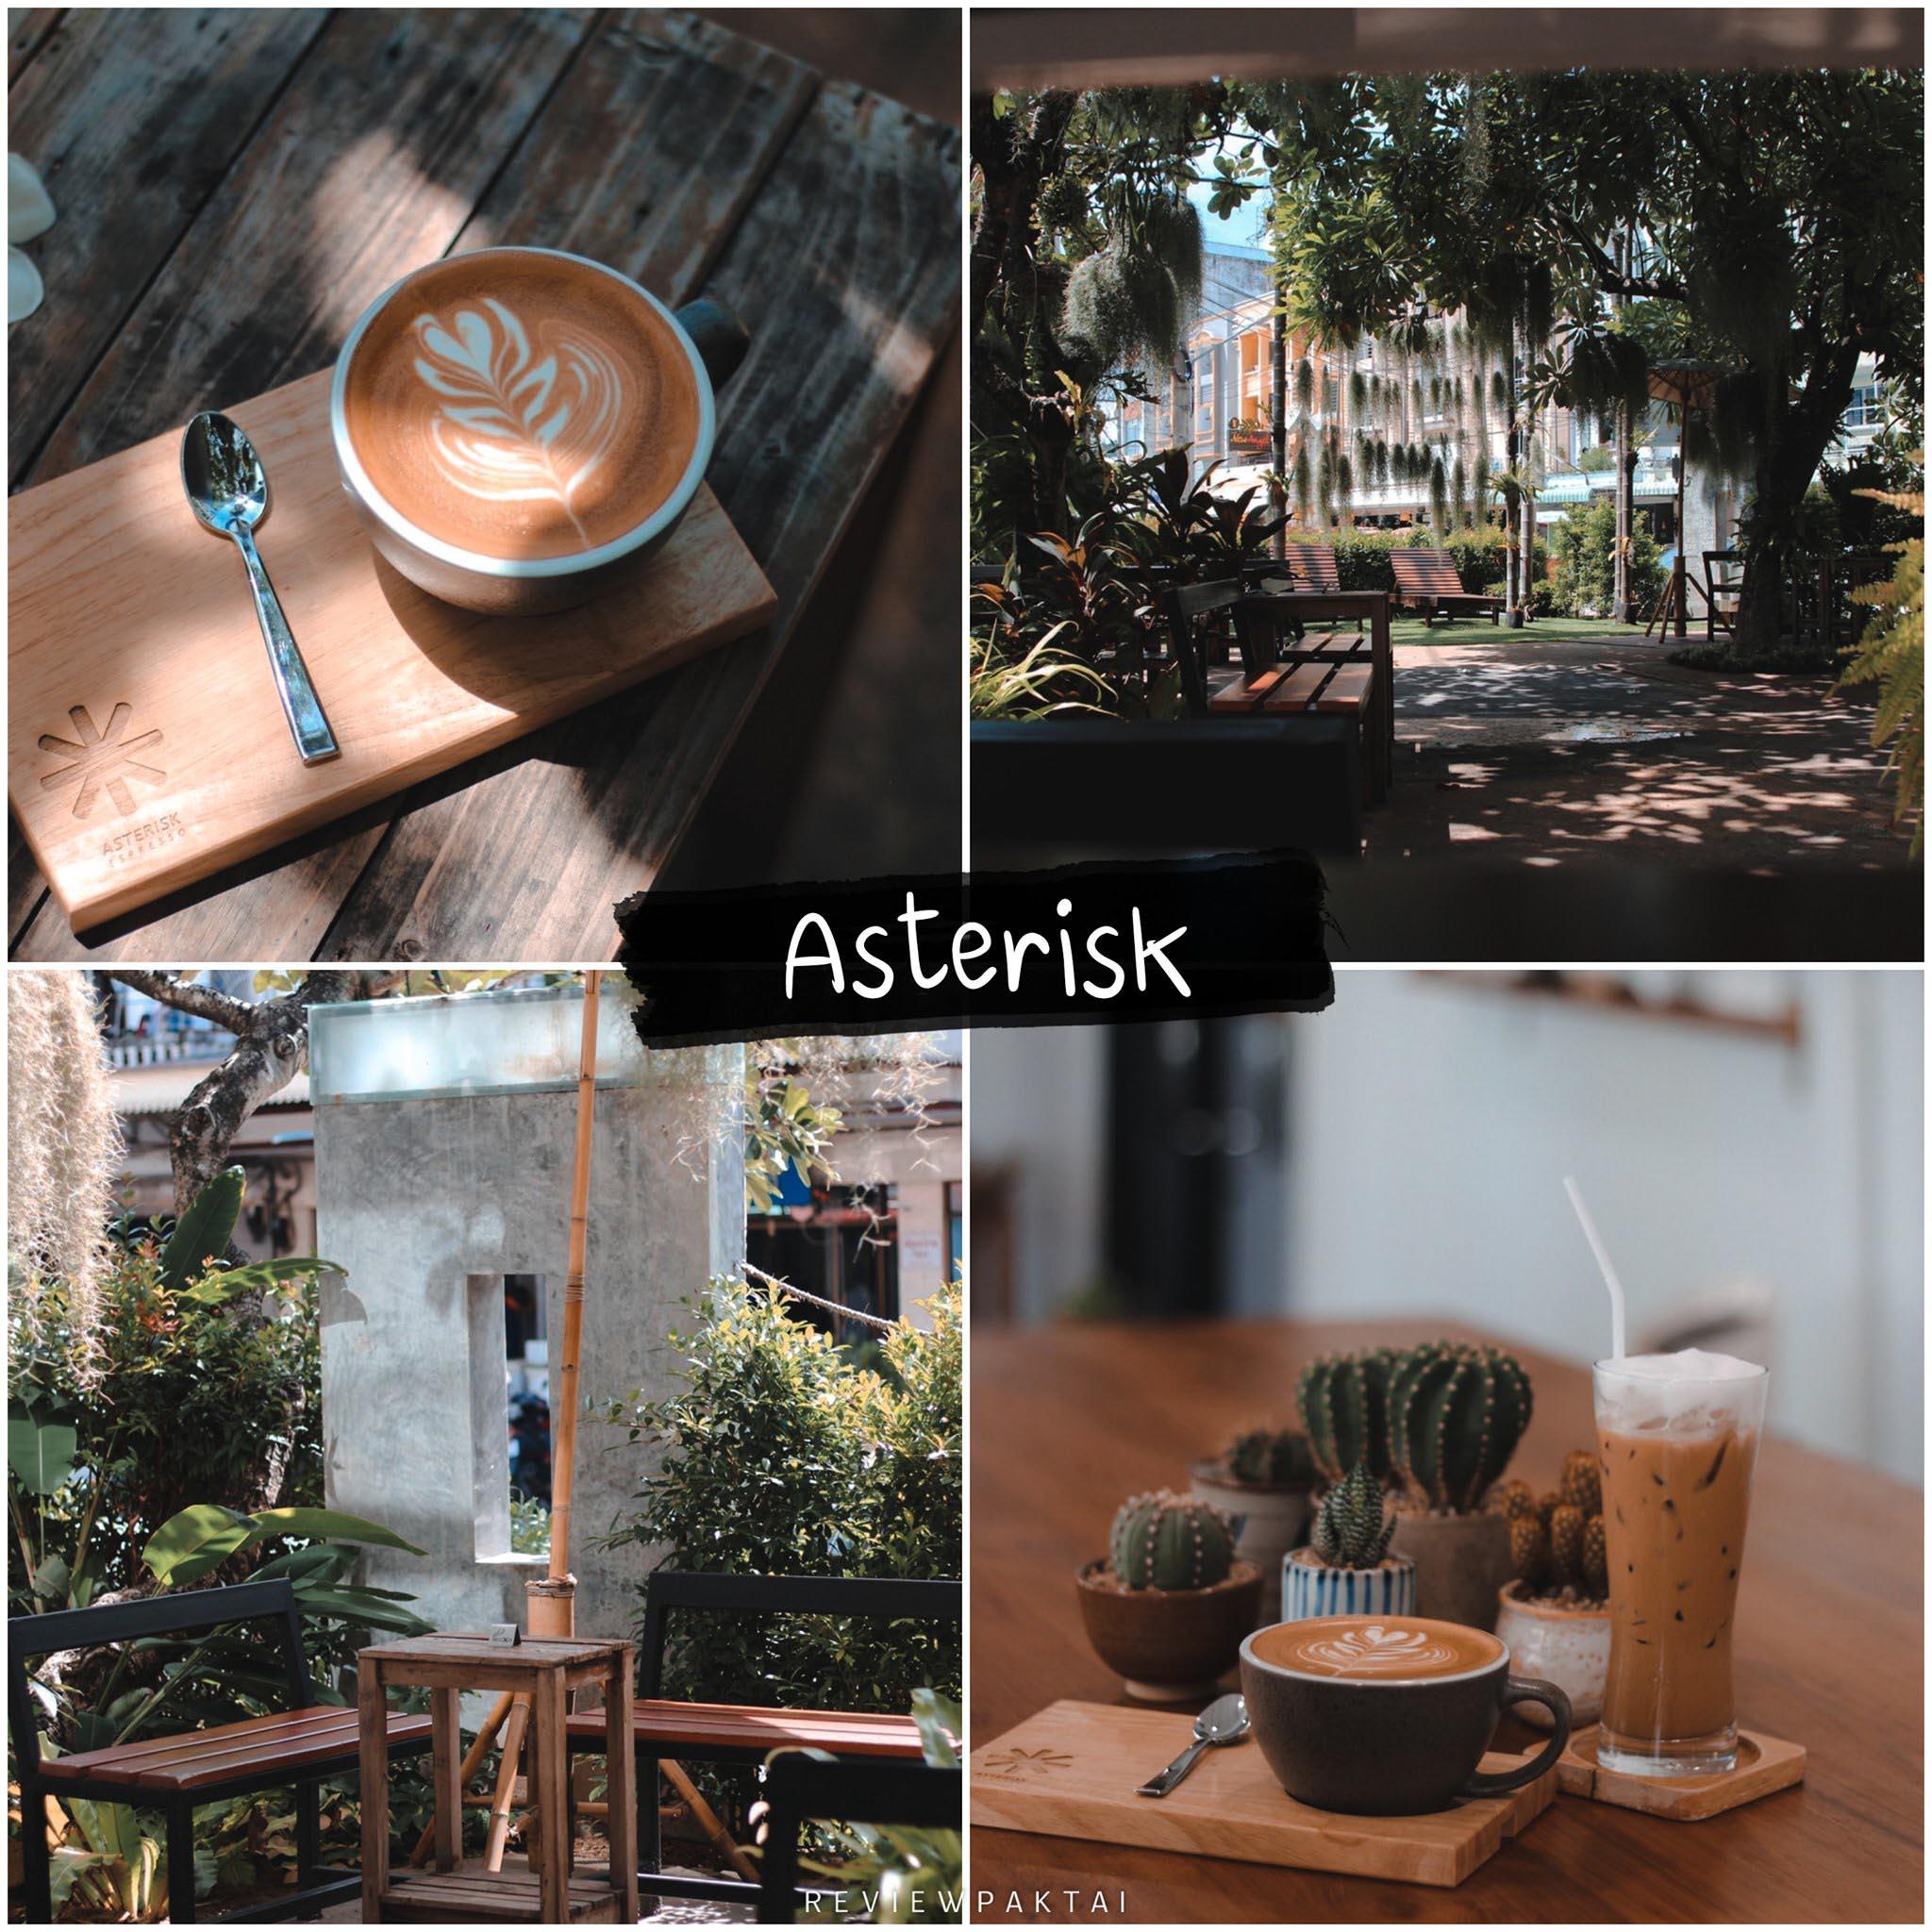 Asterisk-espresso จุดเช็คอินสายชิล-Asterisk-espresso-กาแฟดี-ร้านมีทีเด็ดเรื่องกาแฟ-คอกาแฟจะปลื้มแน่นอนที่นี้-ที่ร้านมีกาแฟหลายสายพันธุ์ให้เลือกให้ลอง-ไม่มาคือพลาดมากแม่-- ร้านชิวกับเพื่อนๆ-มีทั้งห้องแอร์และห้องธรรมดาให้เลือกนั่งได้ตามใจคุณ-อาหารและเครื่องดื่มอร่อยแน่นอน300%-ความชิวนี้ไม่ไปไม่ได้แล้ว-อาหารหร่อย-เครื่องดื่มมีให้เลือกเยอะมาก-กาแฟหอมกรุ่นไม่ผิดหวังอยากไปตามพิกัดนี้เลย-74-274-ถนน-พูนผล-ตำบลตลาดเหนือ-เมือง-ภูเก็ตแล้วจะไม่ผิดหวังแน่นอนกับความอร่อย ภูเก็ต,คาเฟ่,ที่เที่ยว,ร้านกาแฟ,เด็ด,อร่อย,ต้องลอง